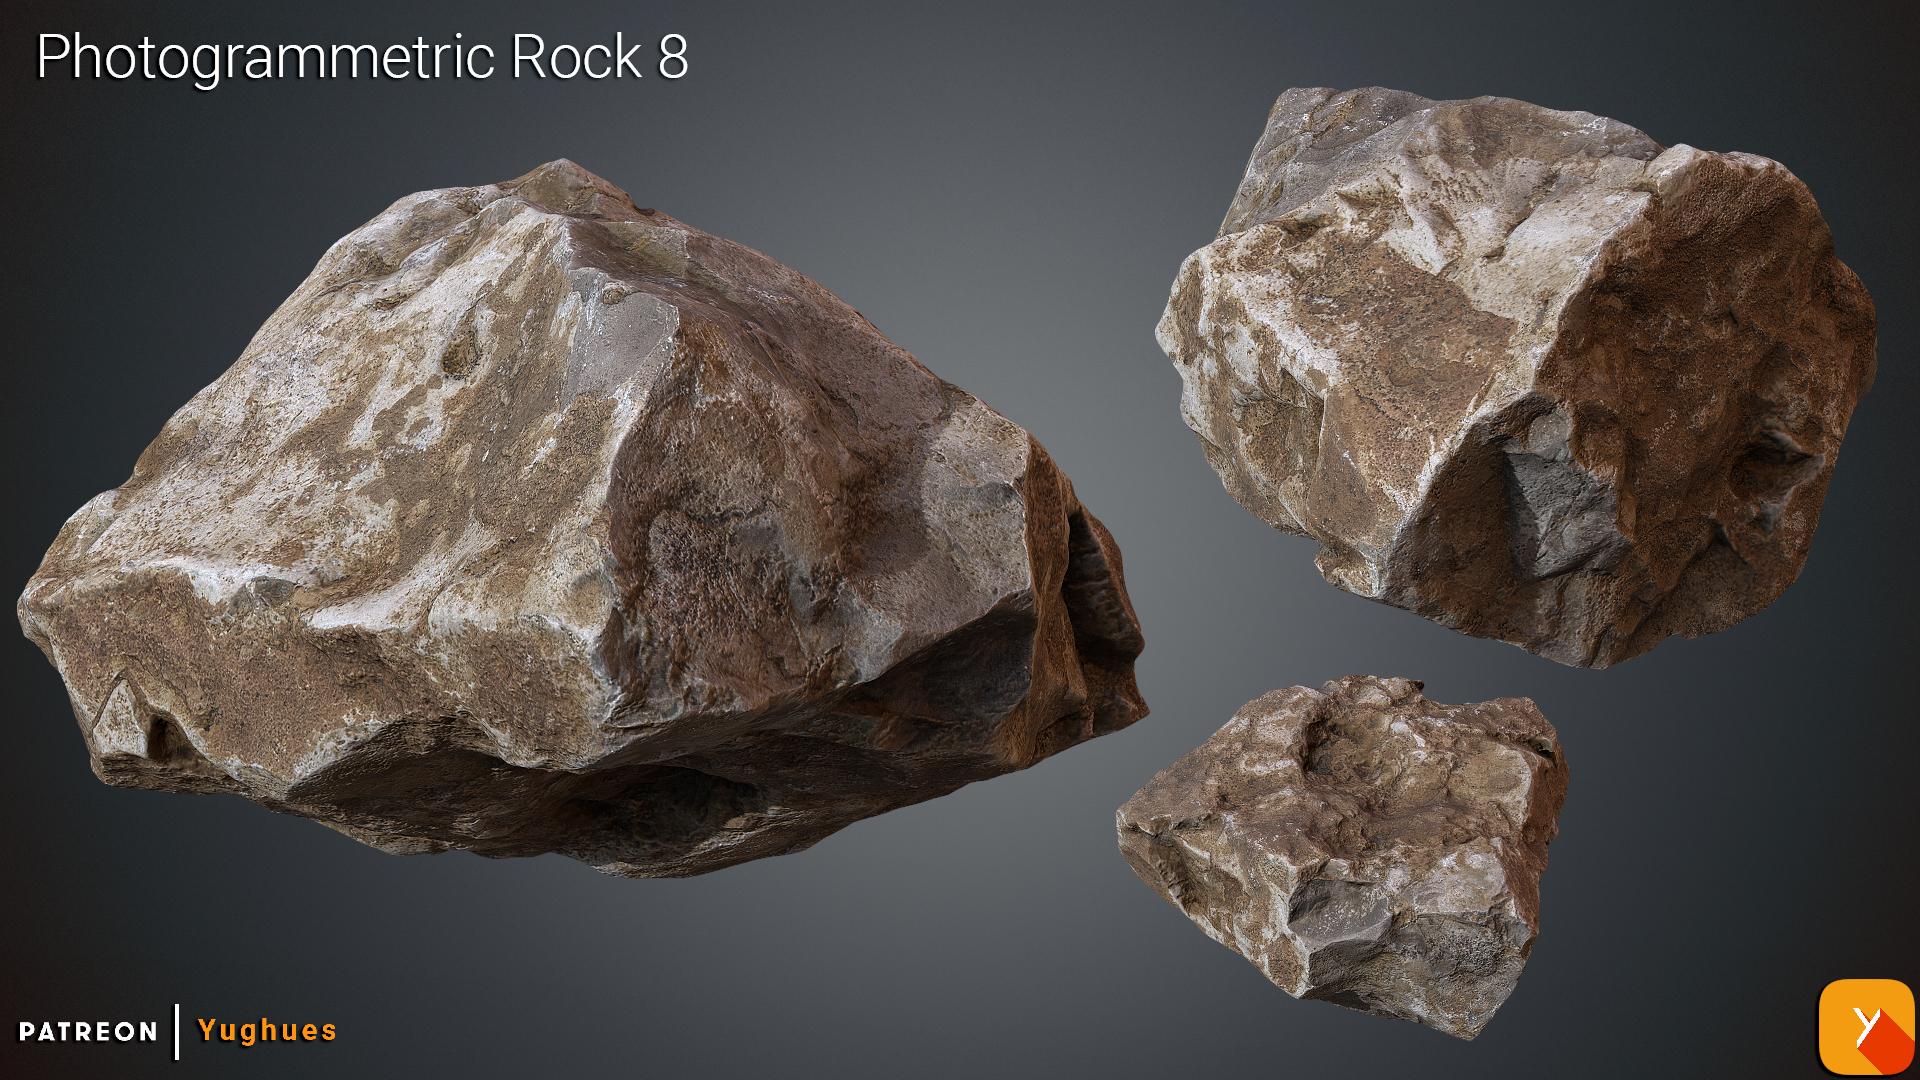 [Free] Photogrammetric Rock 8 by Yughues